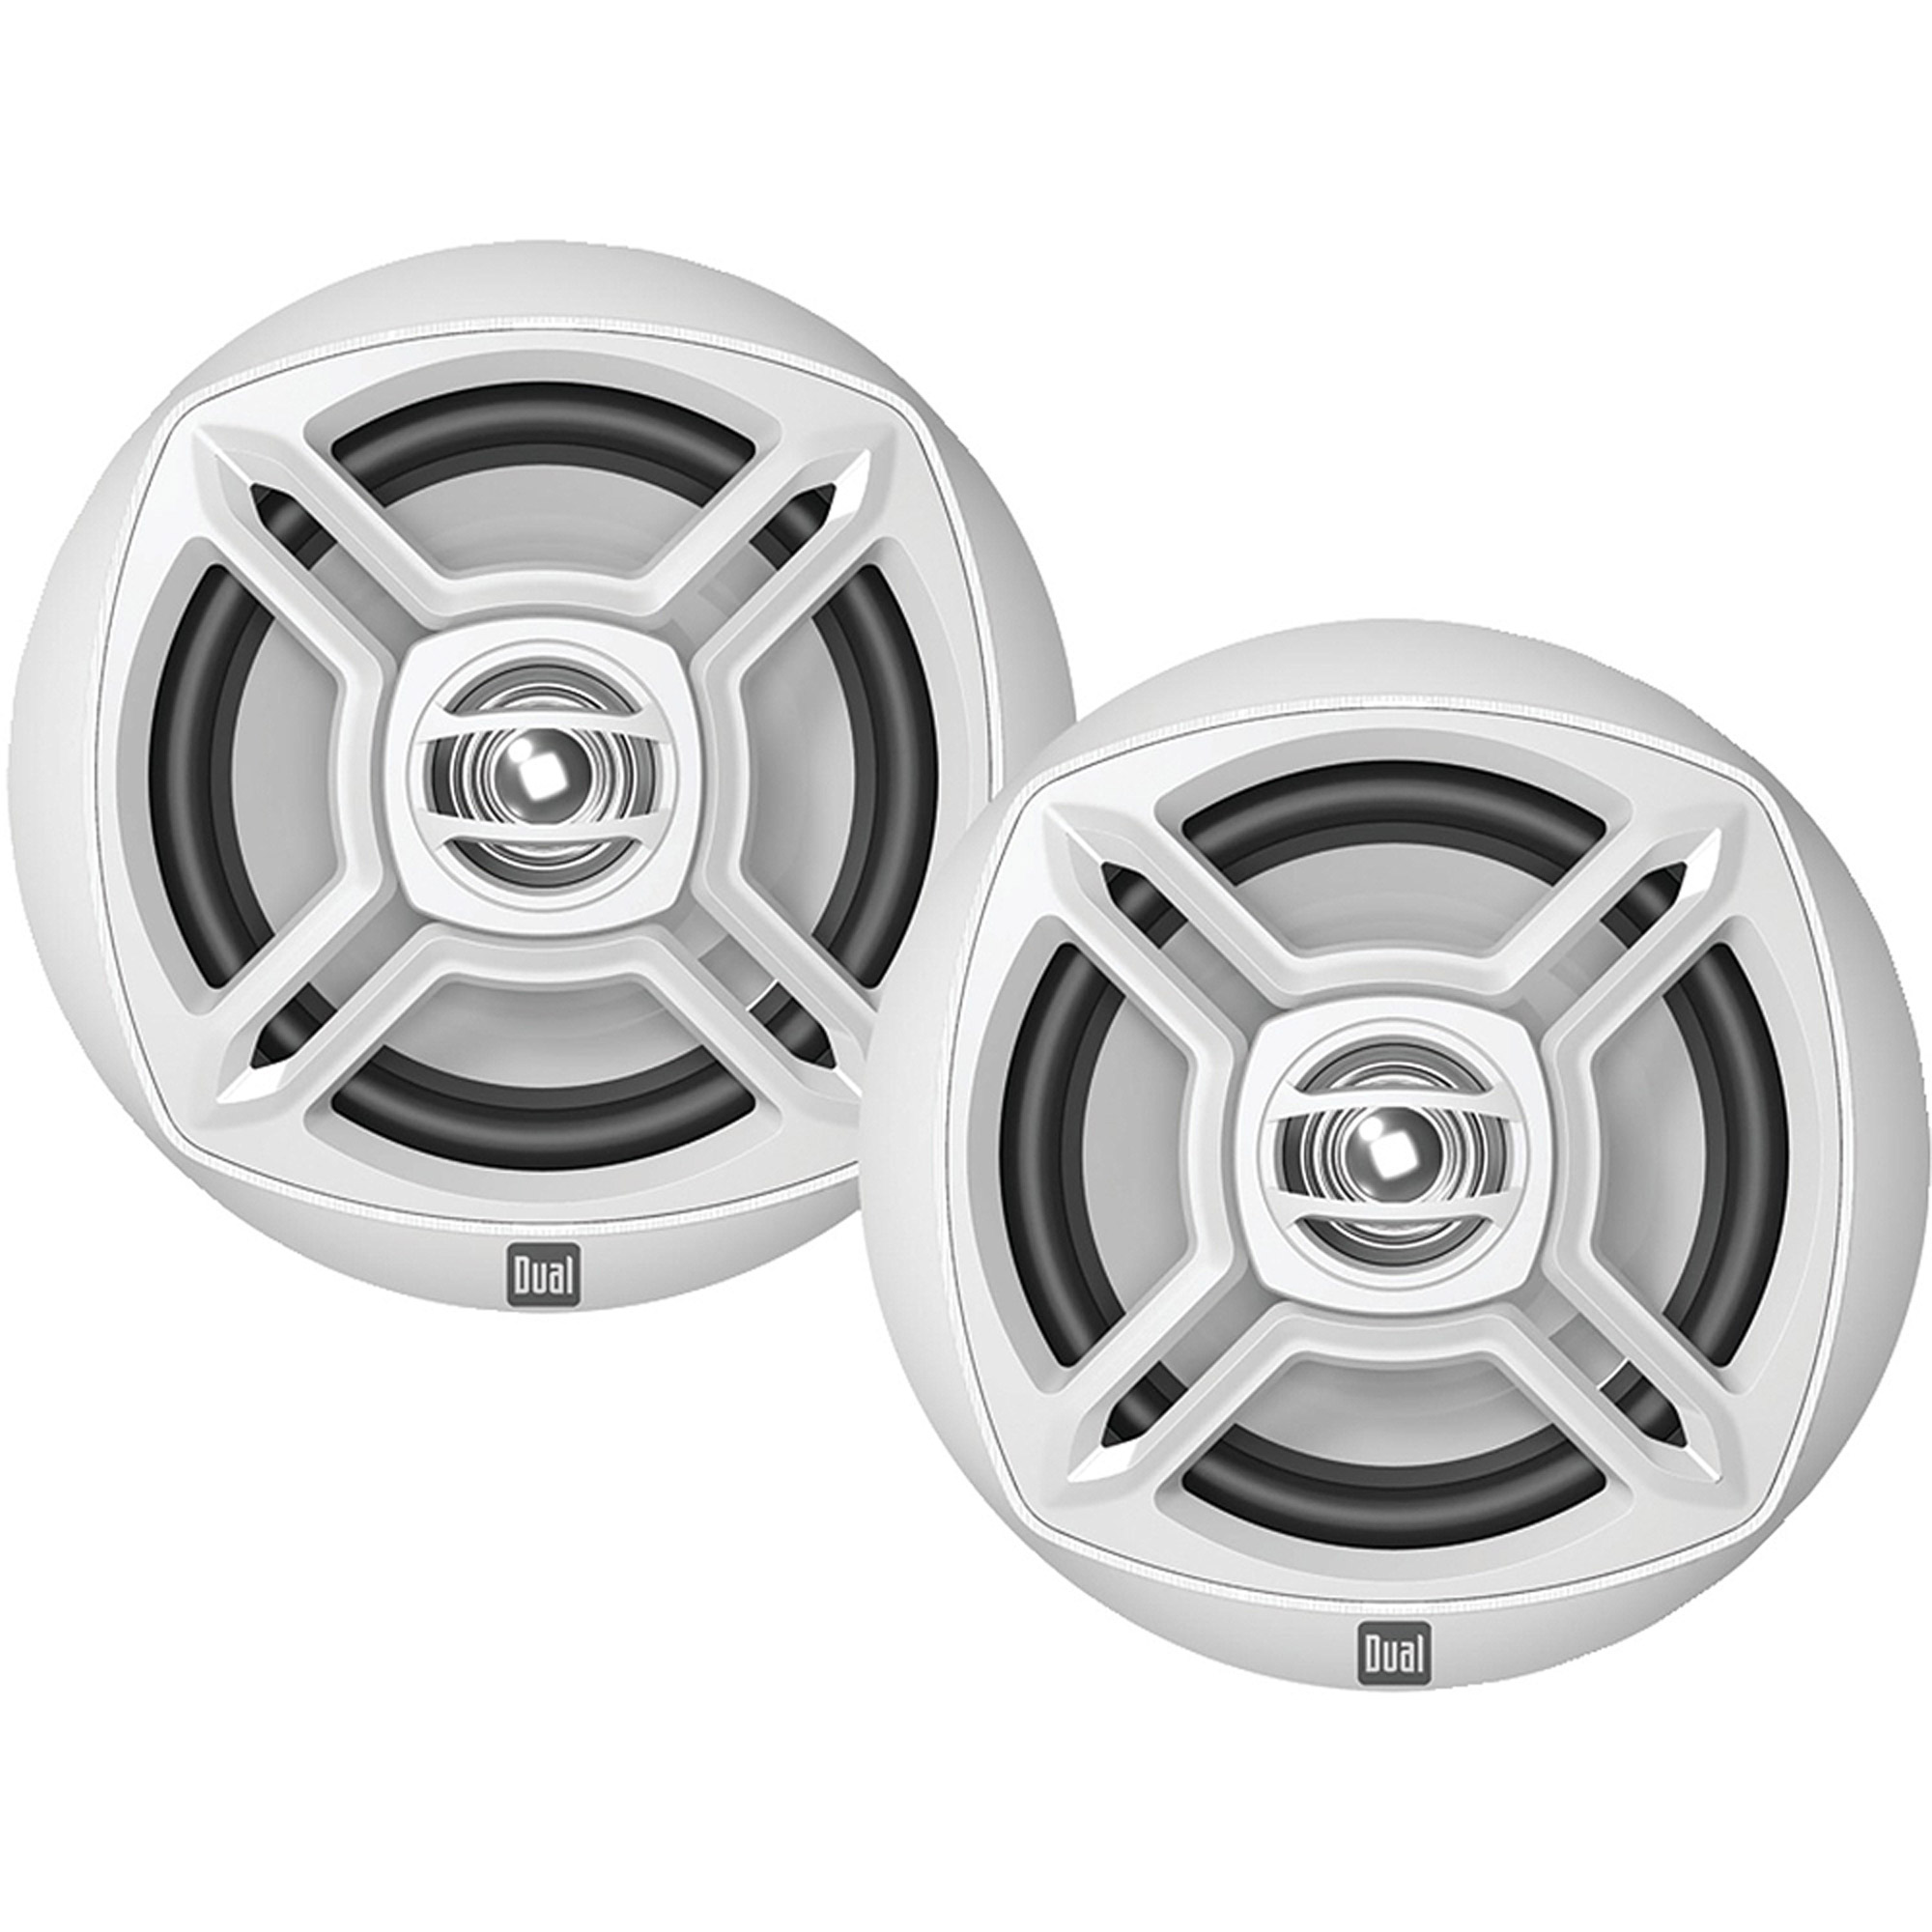 "Dual DMP672 Marine DM Series 6.5"" Dual-Cone Speakers, White"